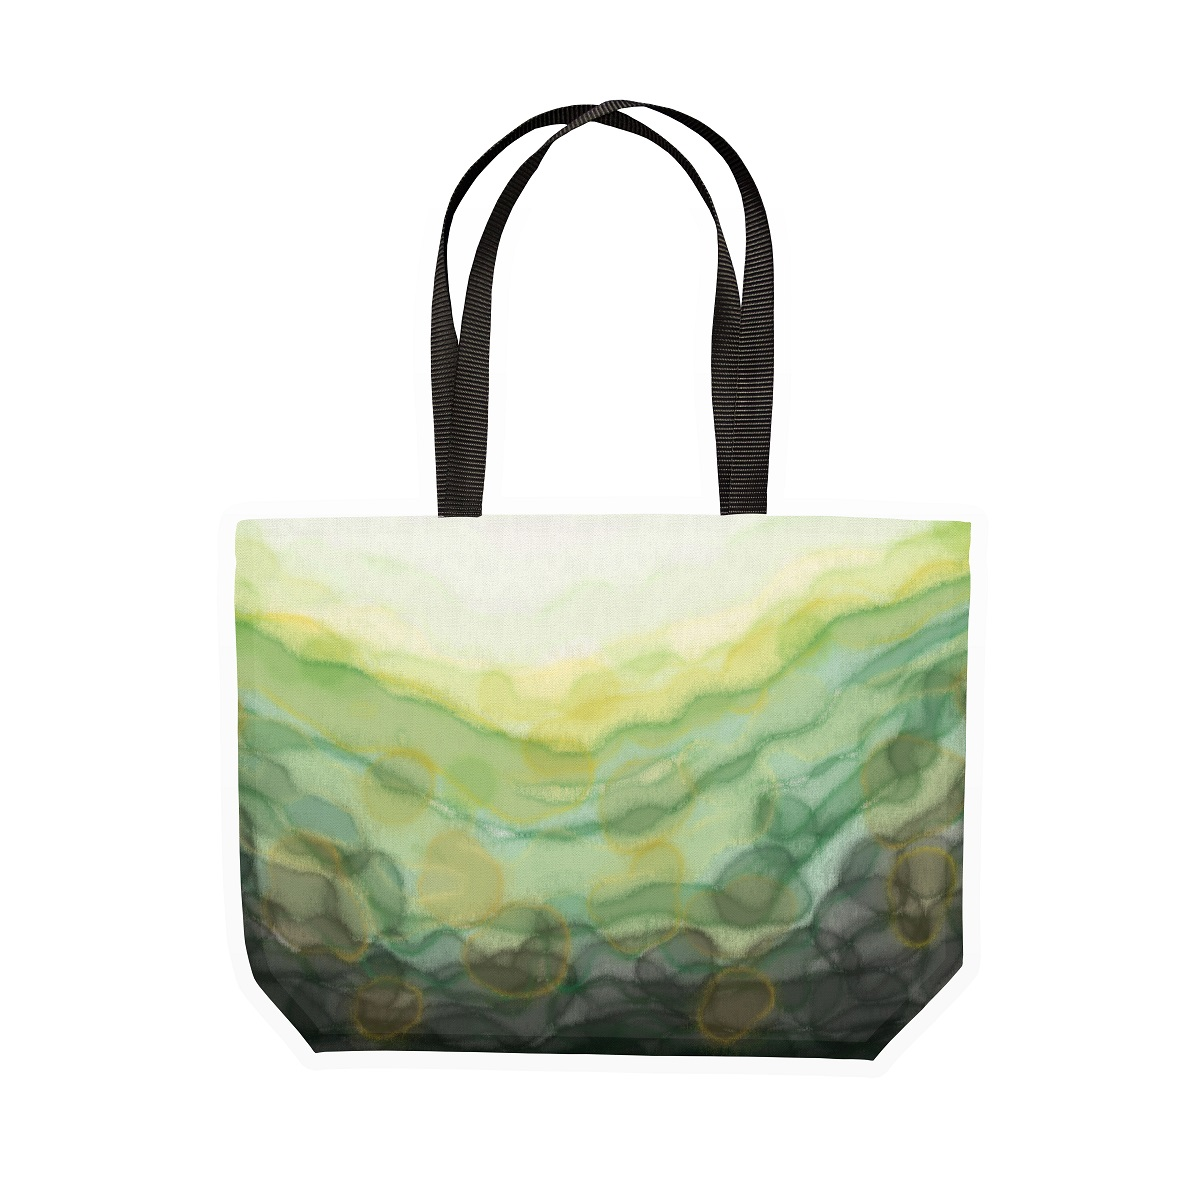 3. Green _Serenity_ Tote Bag - Vegan Reusable Shopping Bag for www.silvermagazine.co.uk